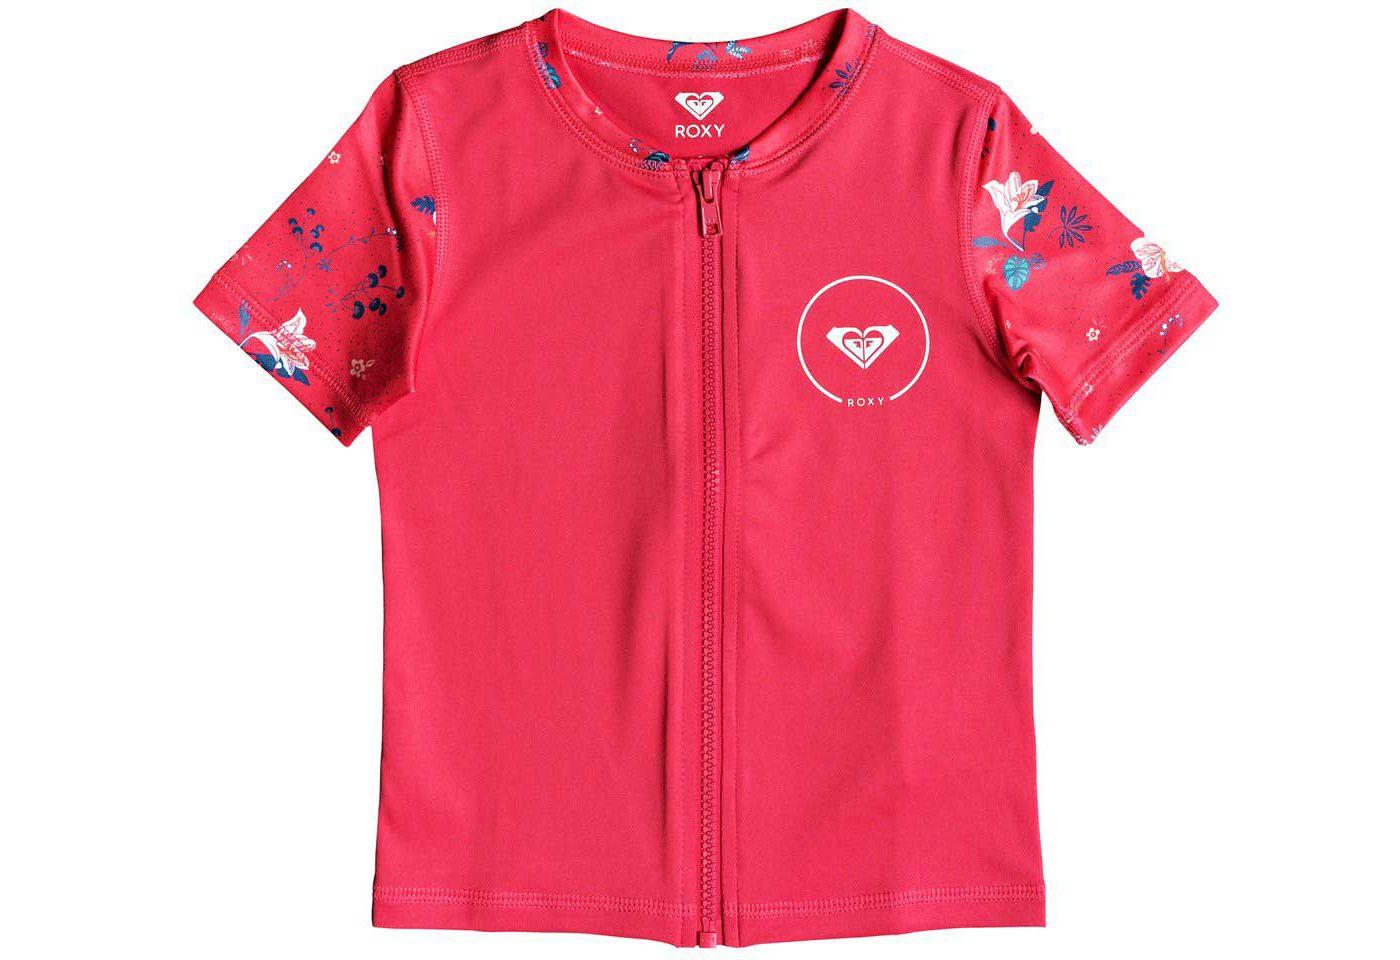 Roxy Girls' Shortbreak Short Sleeve Zippered Rash Guard